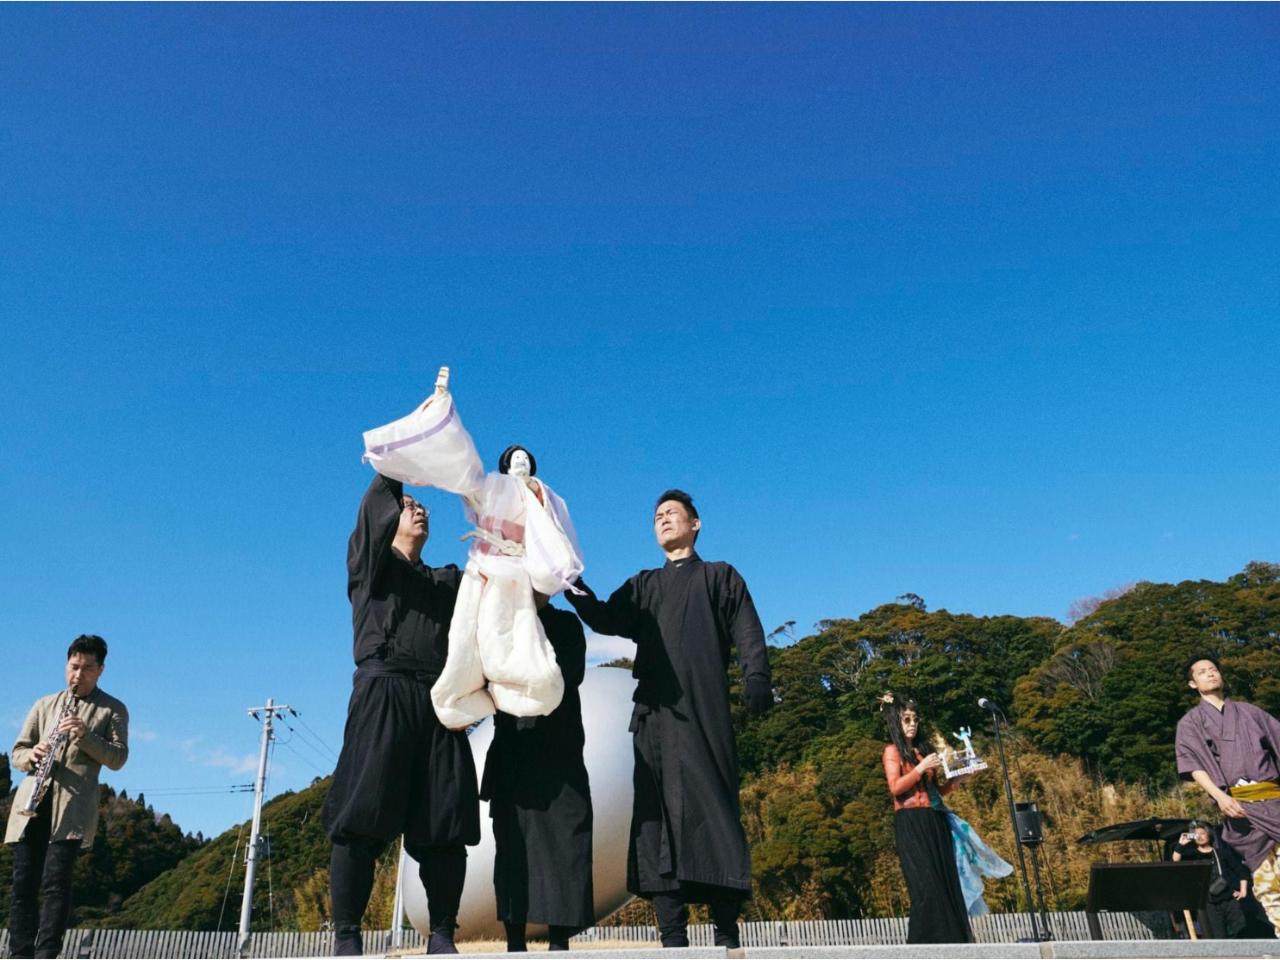 True Life 浄瑠璃人形と音楽のコラボレーション